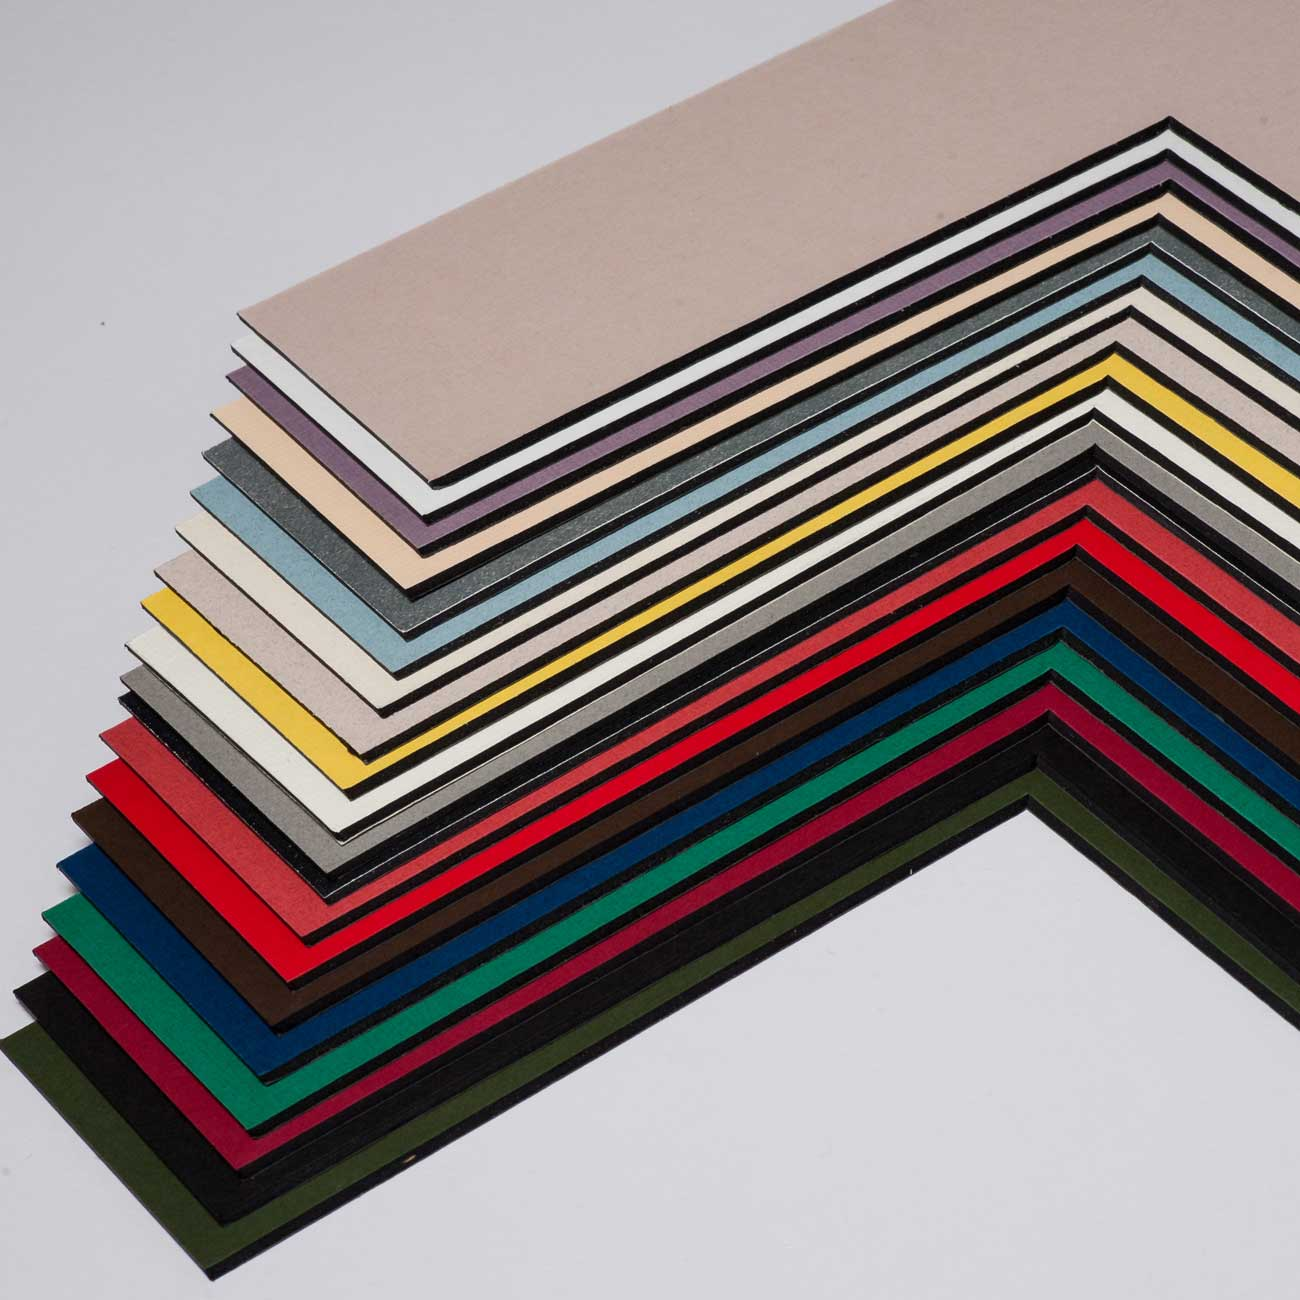 aicham larson juhl 1 4 mm blackcore passepartout mit individuellem ausschnitt 24x30 cm. Black Bedroom Furniture Sets. Home Design Ideas